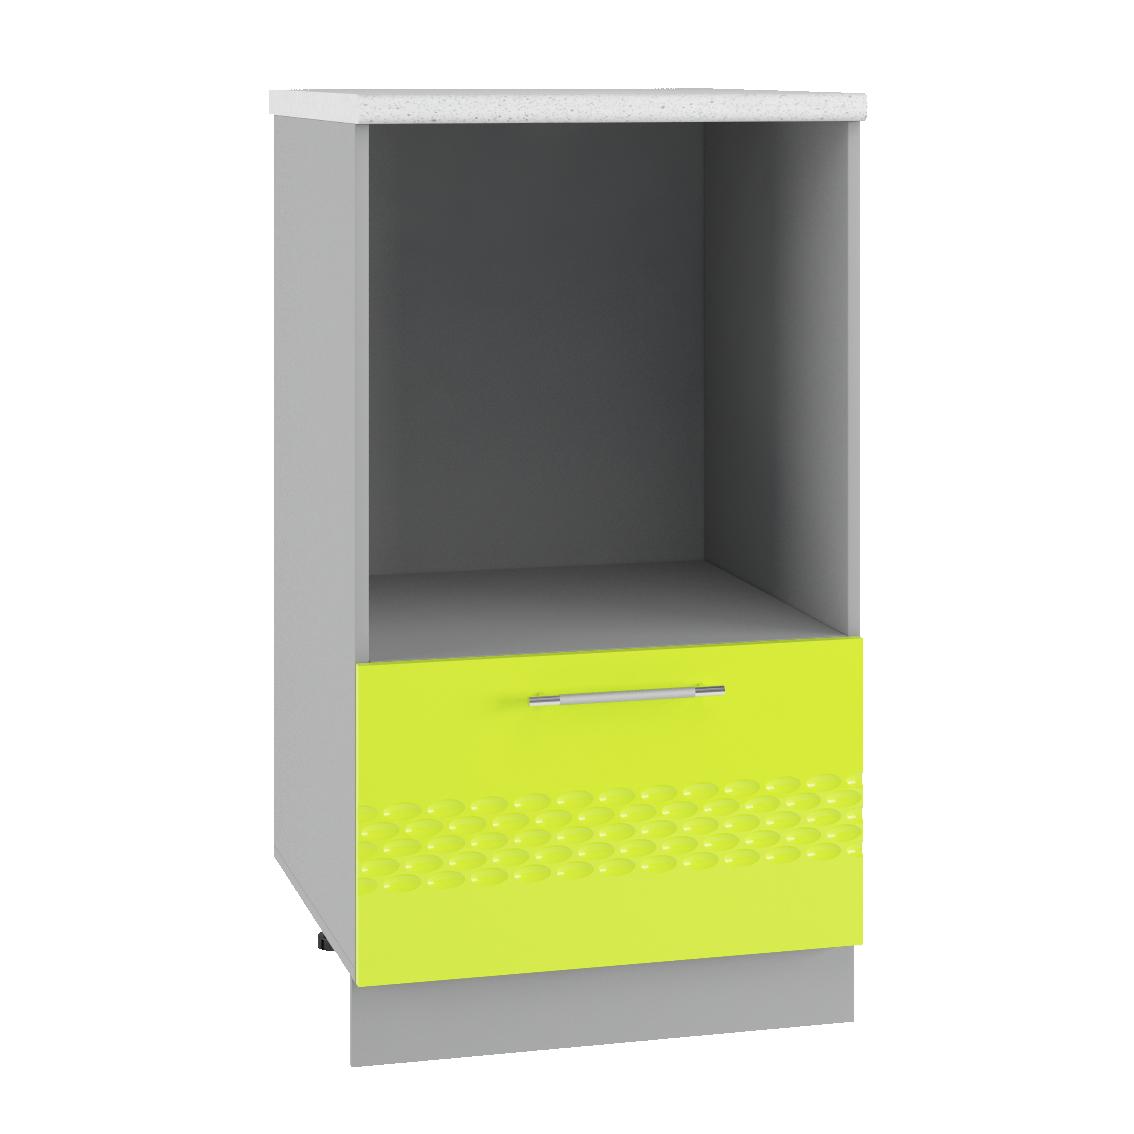 Кухня Капля 3D СН 600 Шкаф для духовки